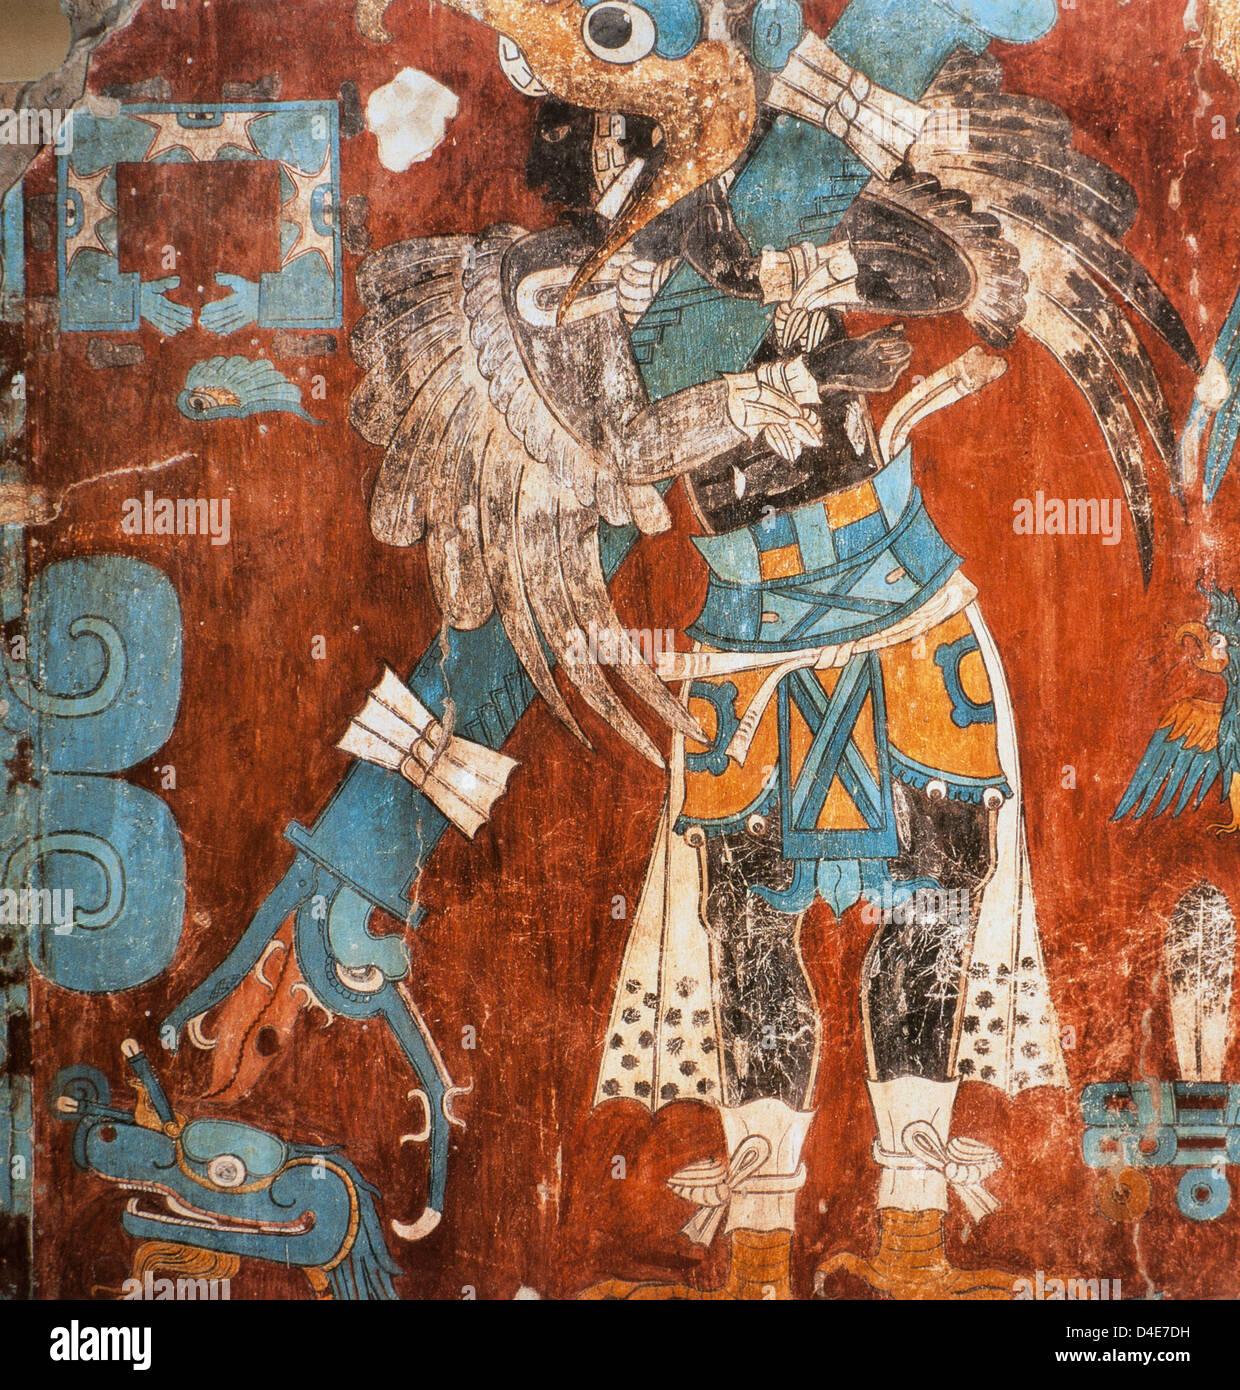 Cacaxtla (Tiaxcala) Battle Scene mural detail c. 900 near Mexico City artist unknown - Stock Image